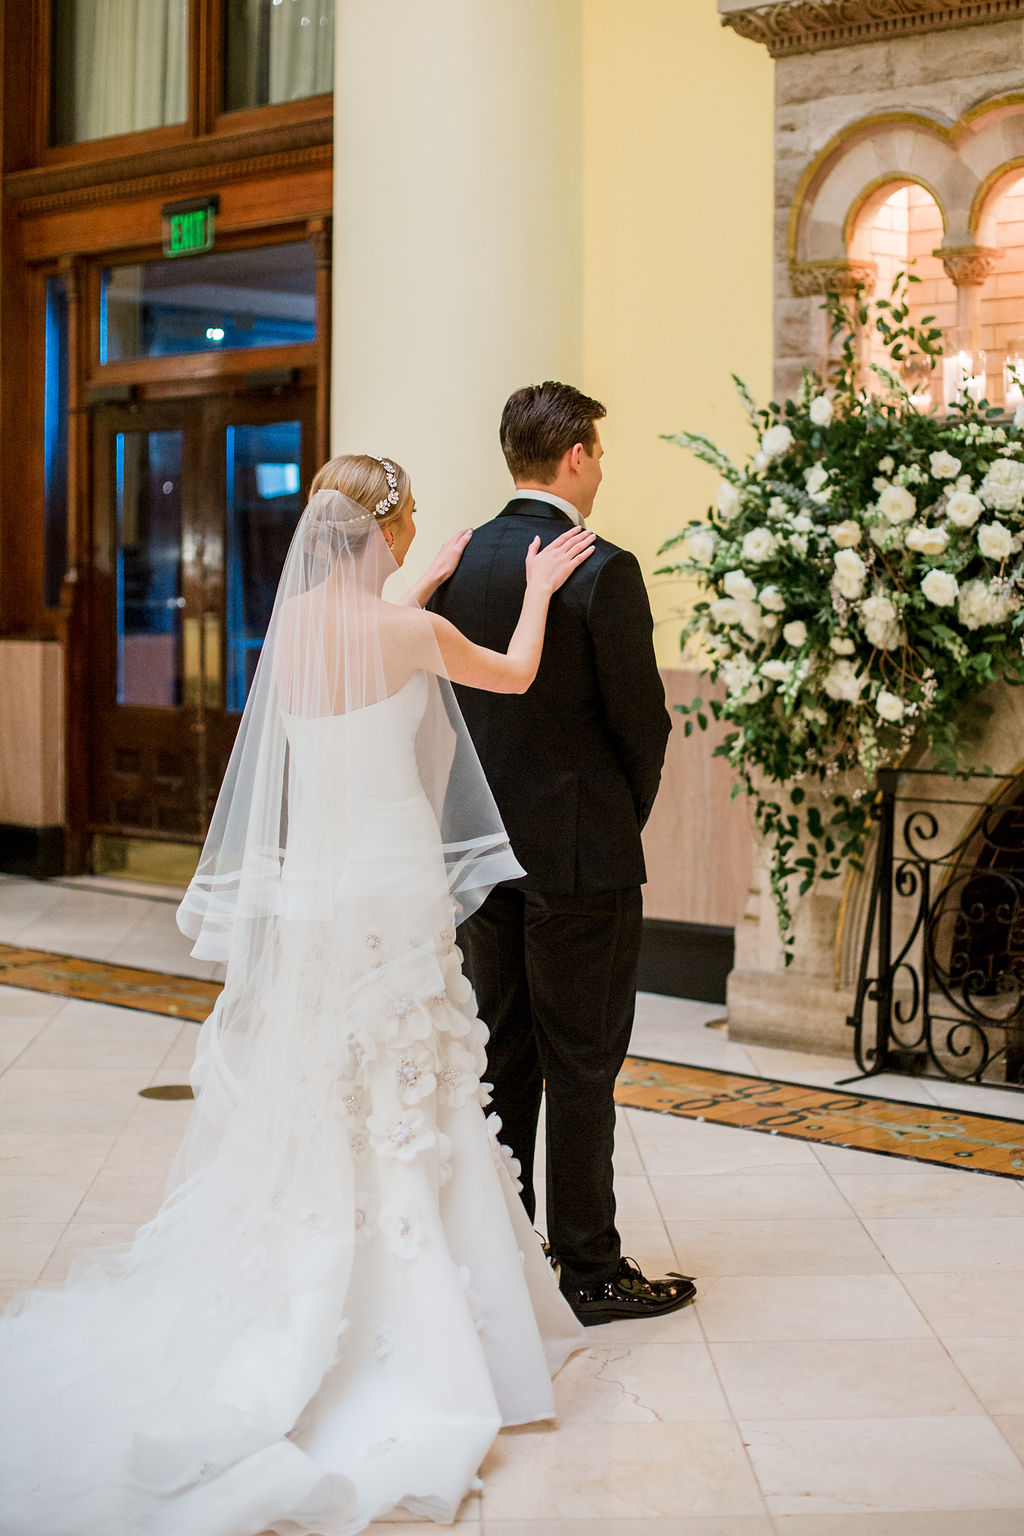 Wedding first look photography: Lavish Union Station Hotel Wedding featured on Nashville Bride Guide